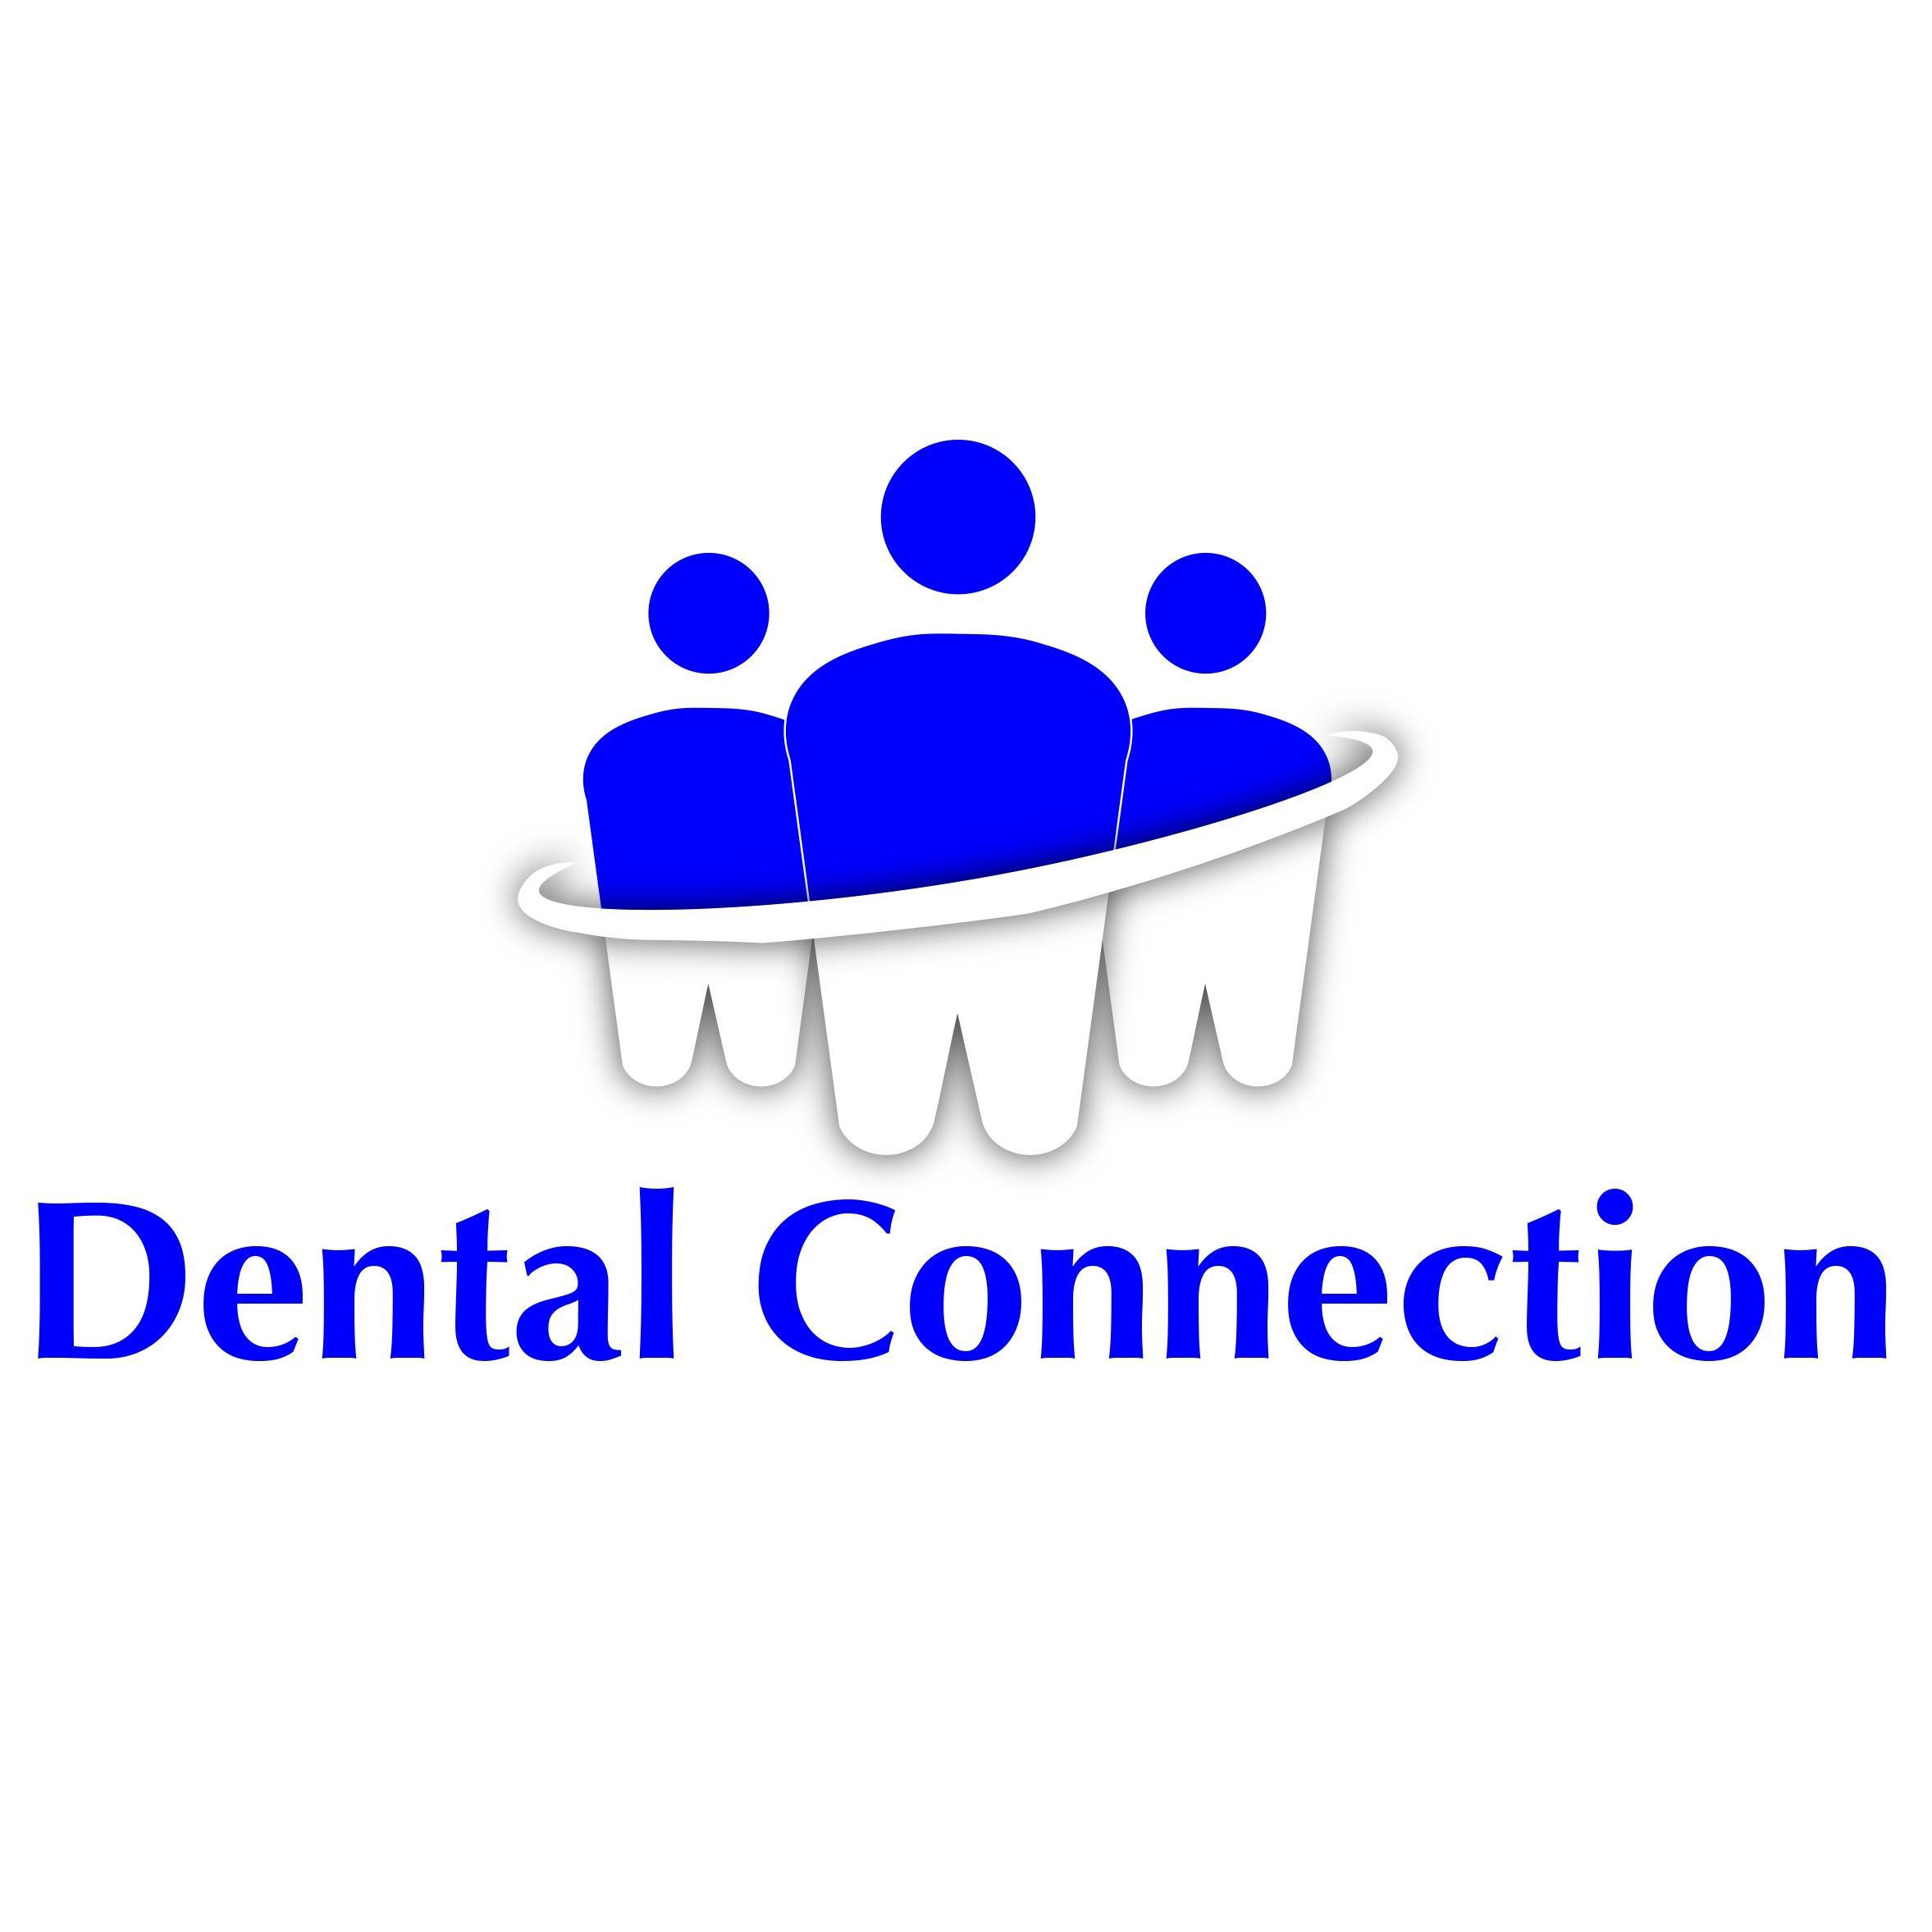 Dental Connection